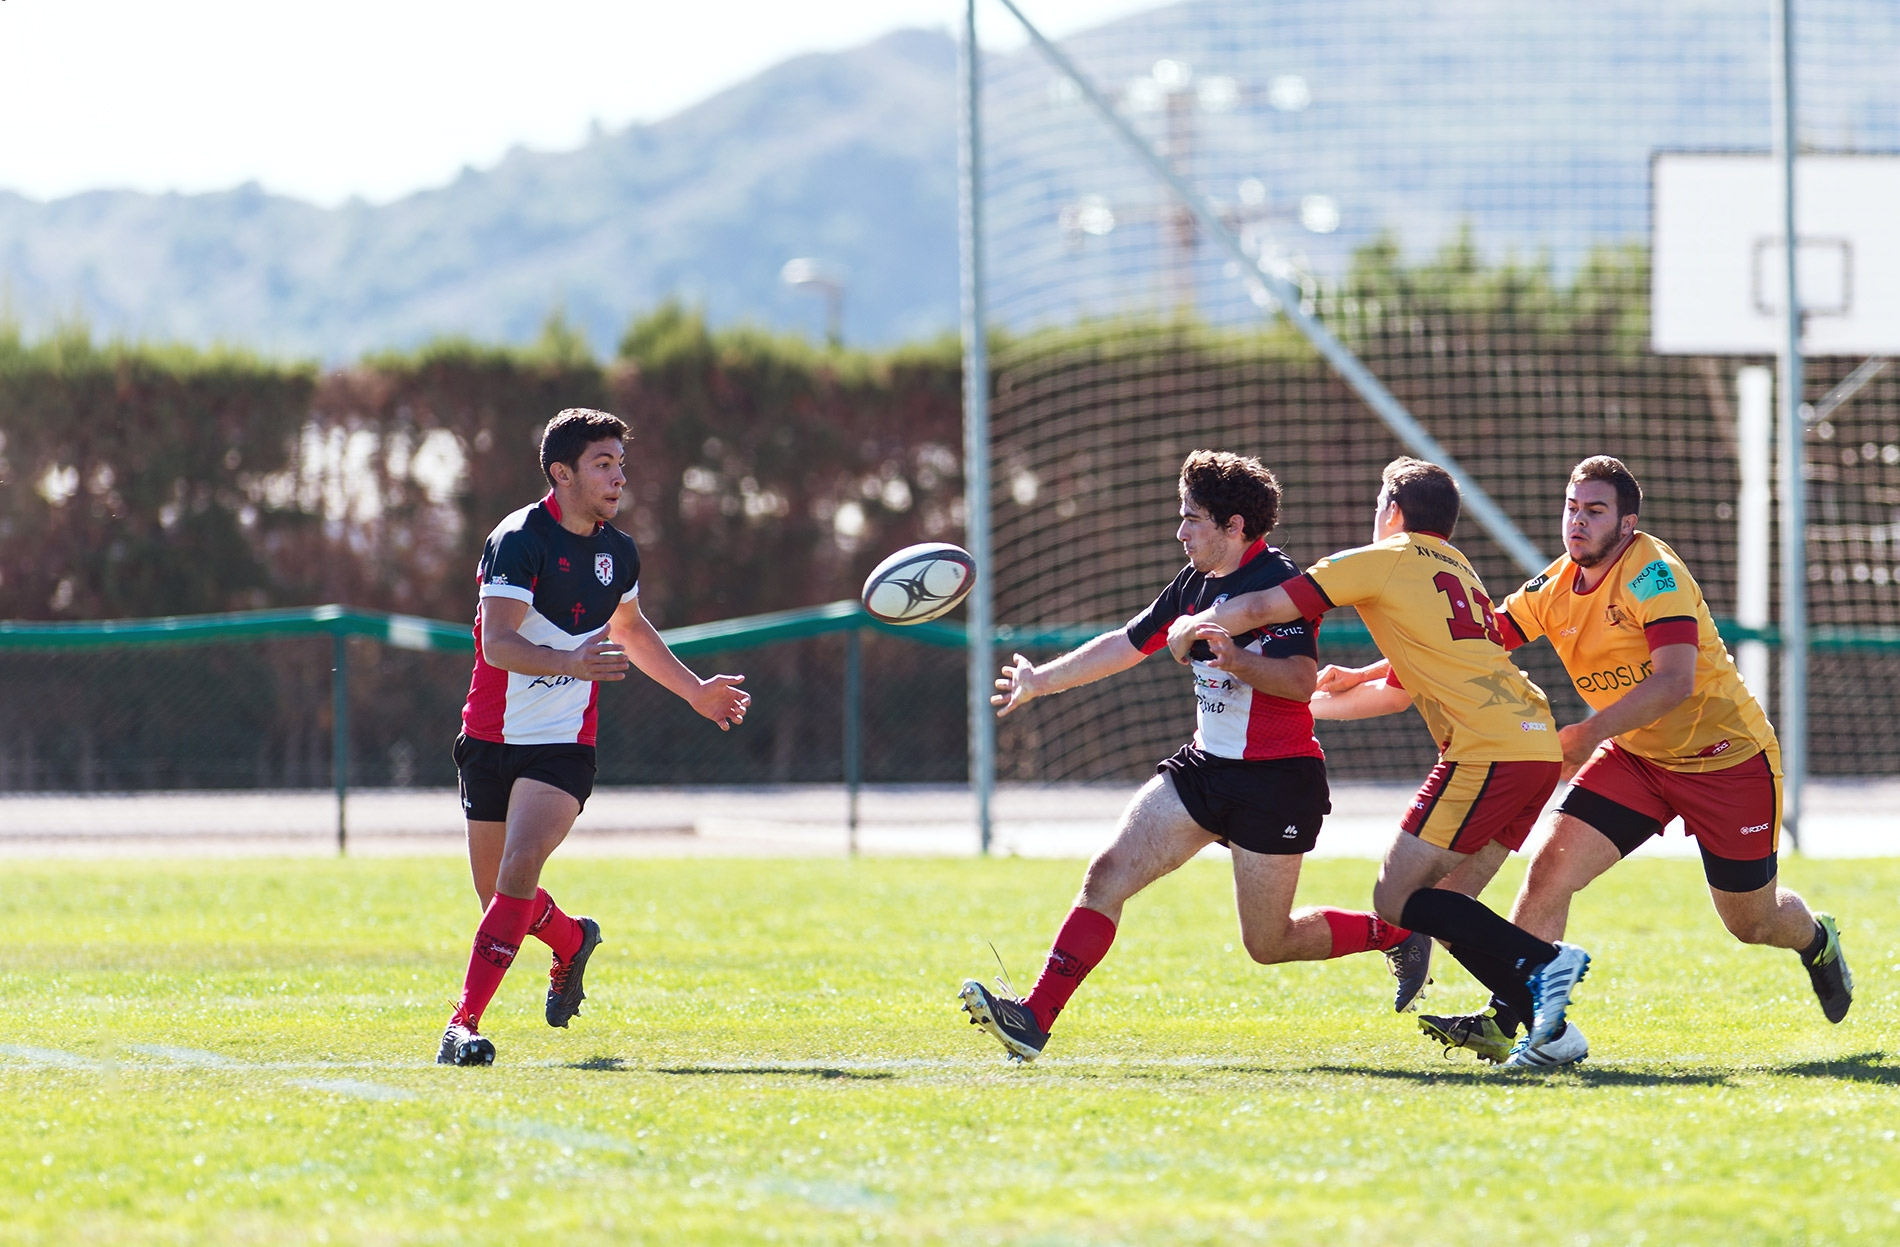 DSC1136_15587.-Rugby.-Reeditada-dic-2019.